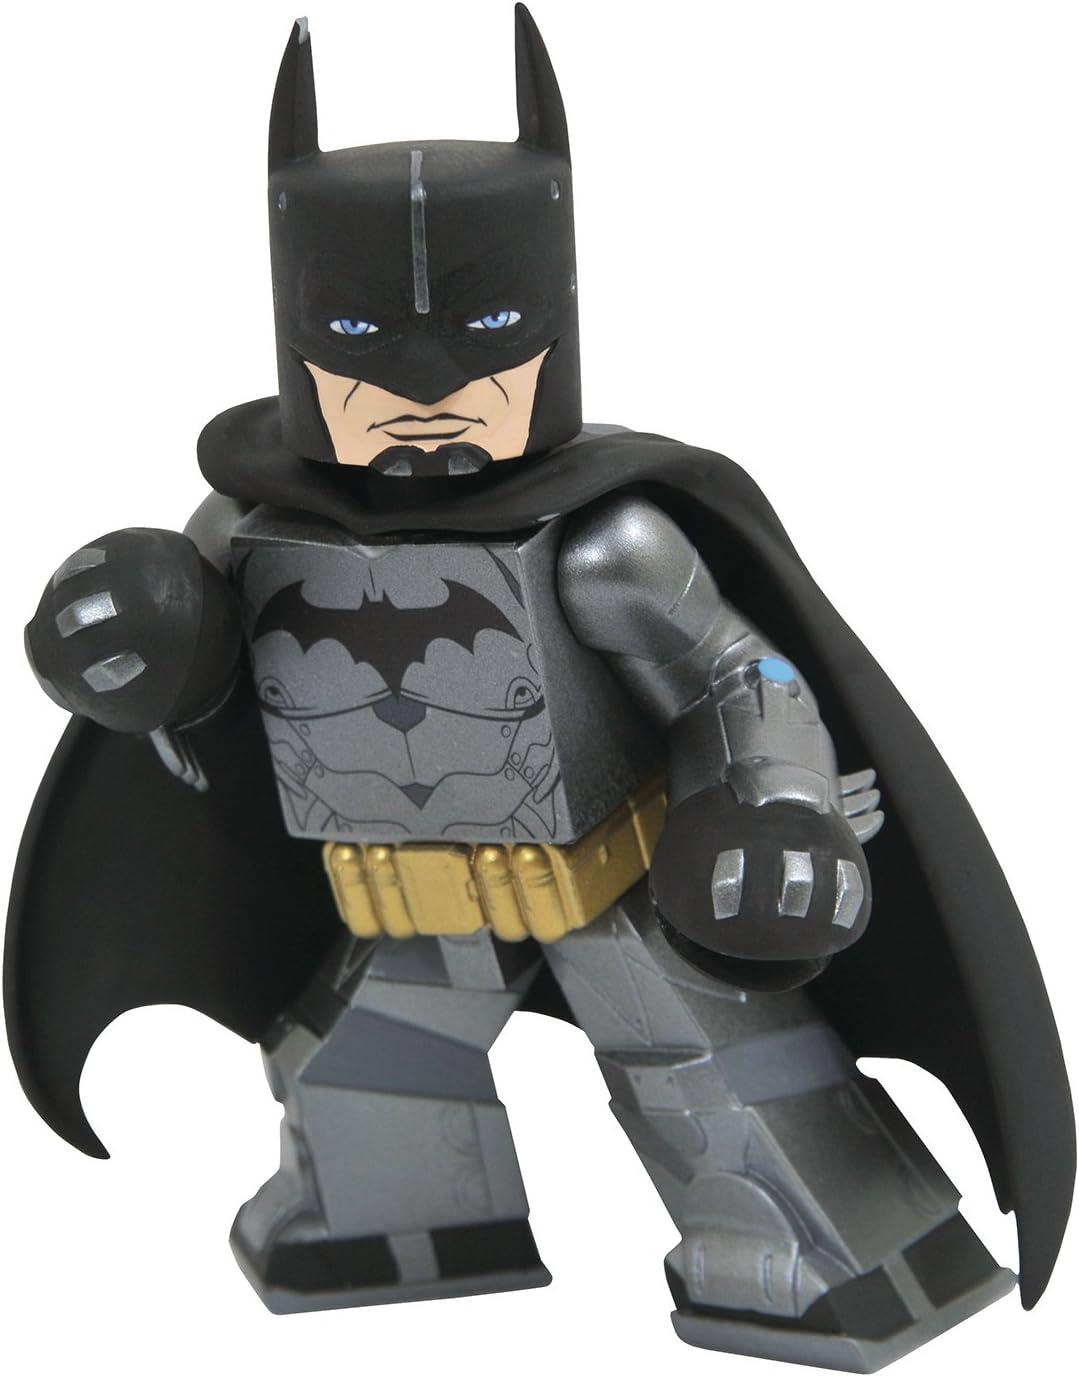 Vinimates DC Injustice 2 Video Game Batman Vinyl Figure